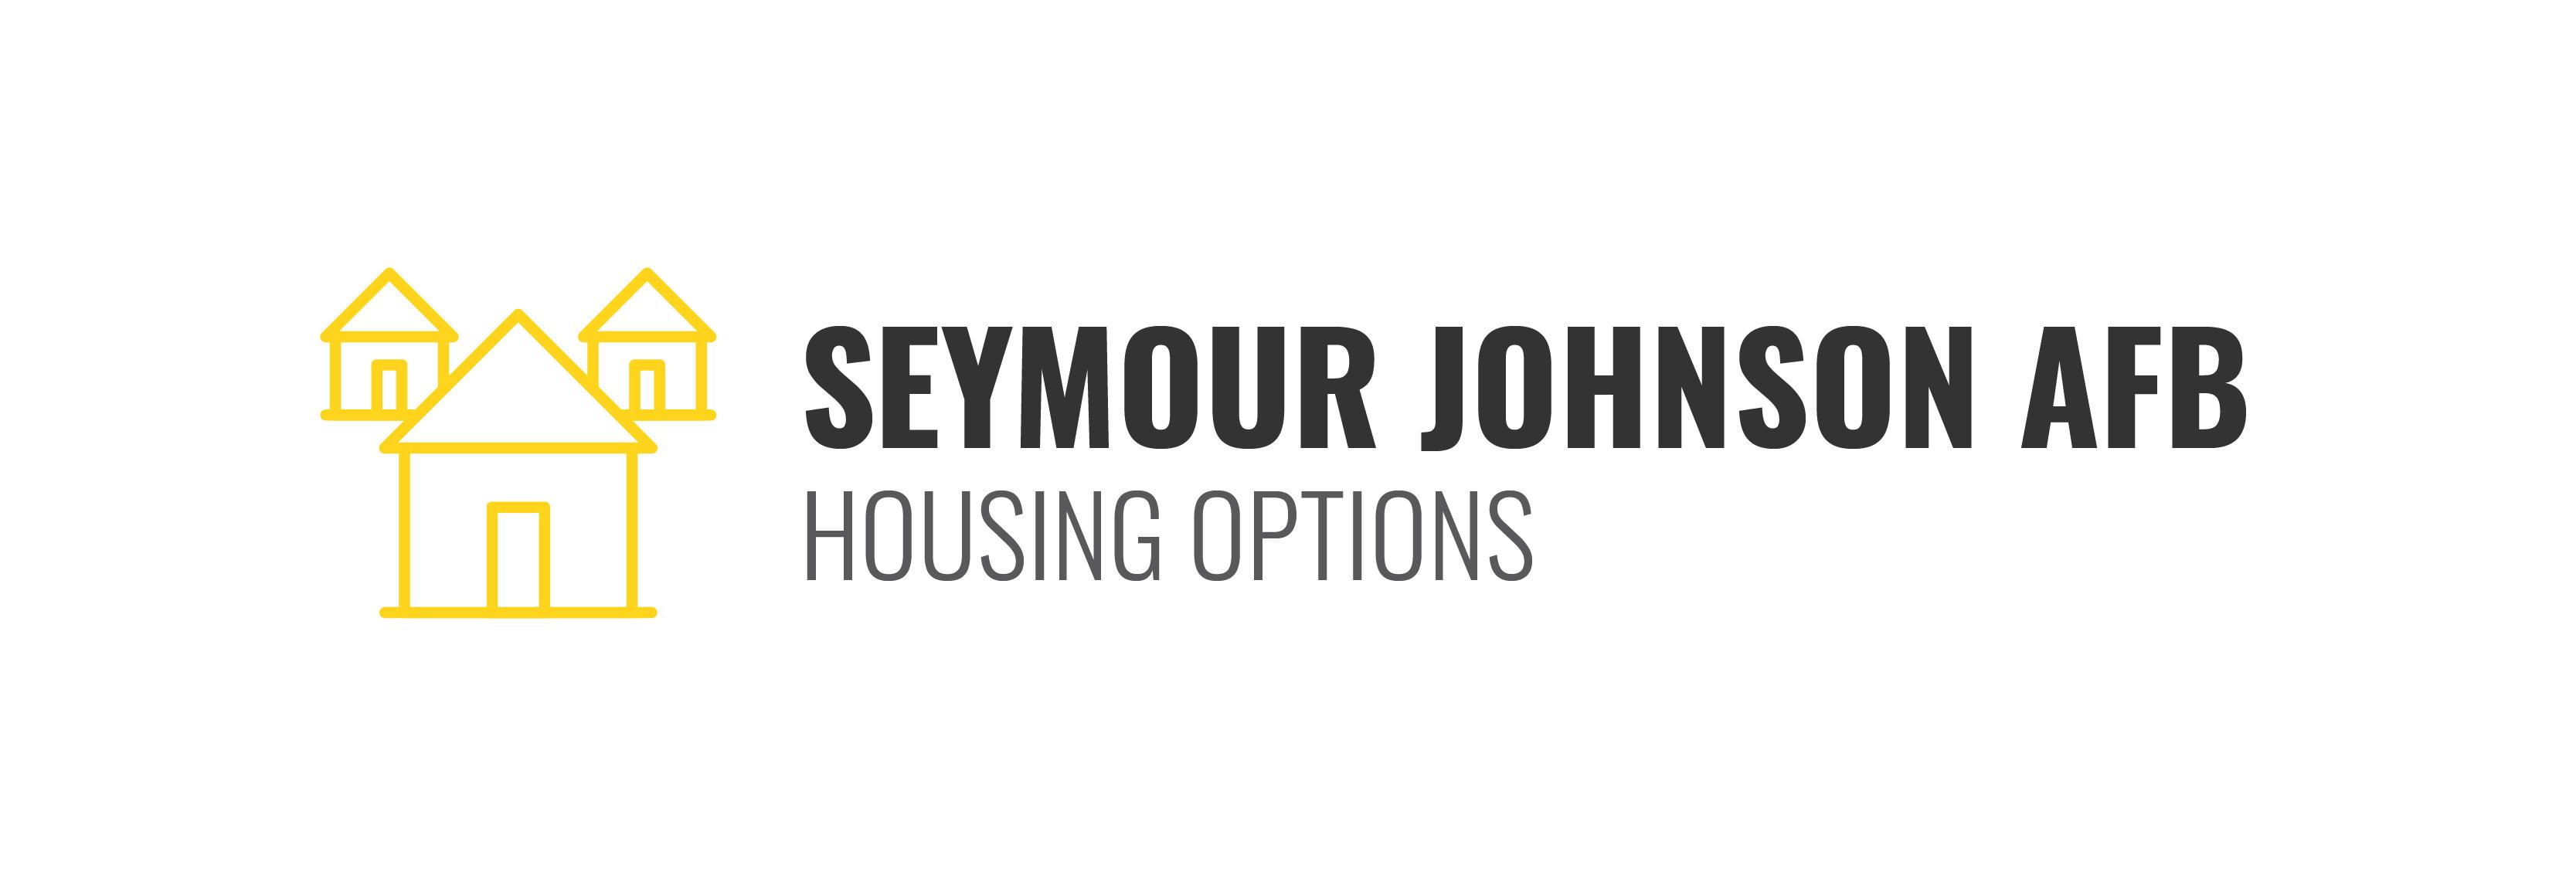 Seymour Johnson Air Force Base Housing Options